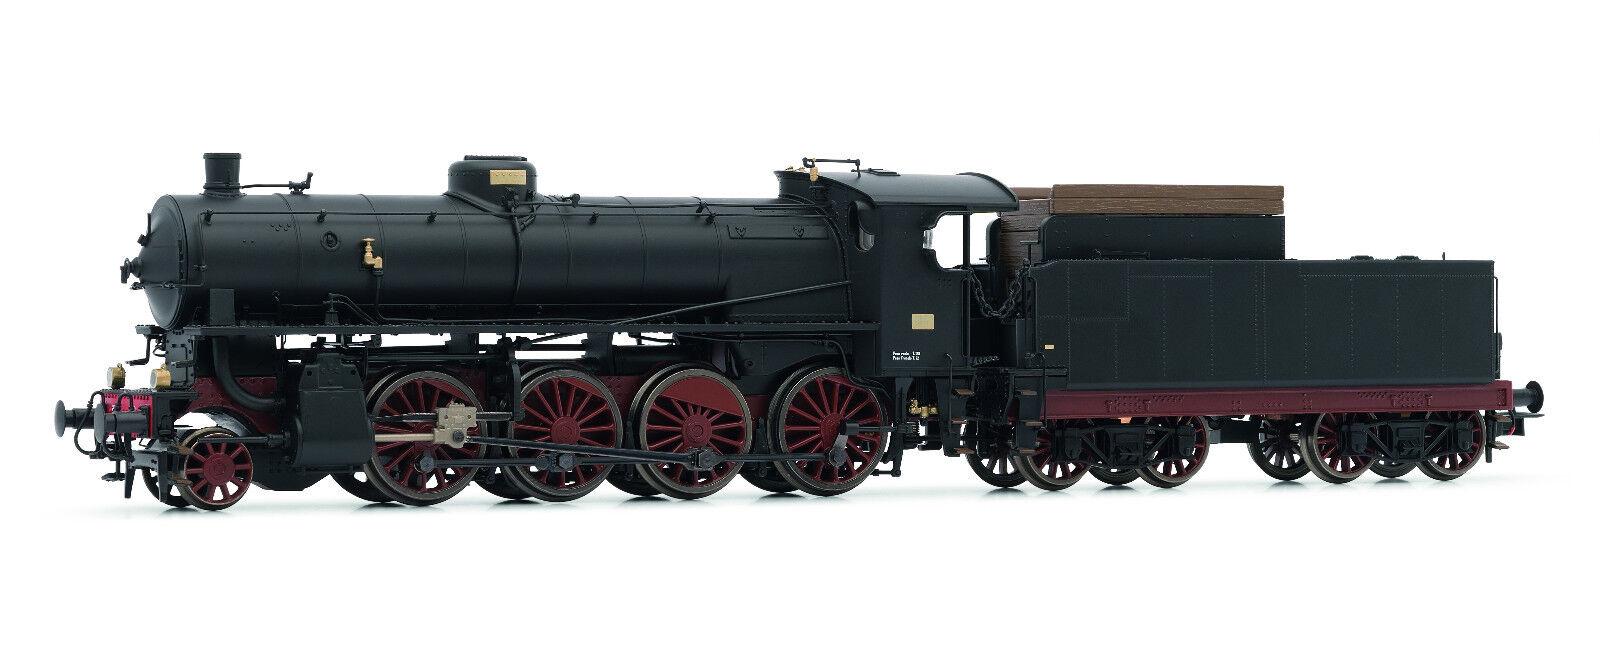 Rivarossi HR2459 damflokomotive 740 119 Capredti FS DC New OVP